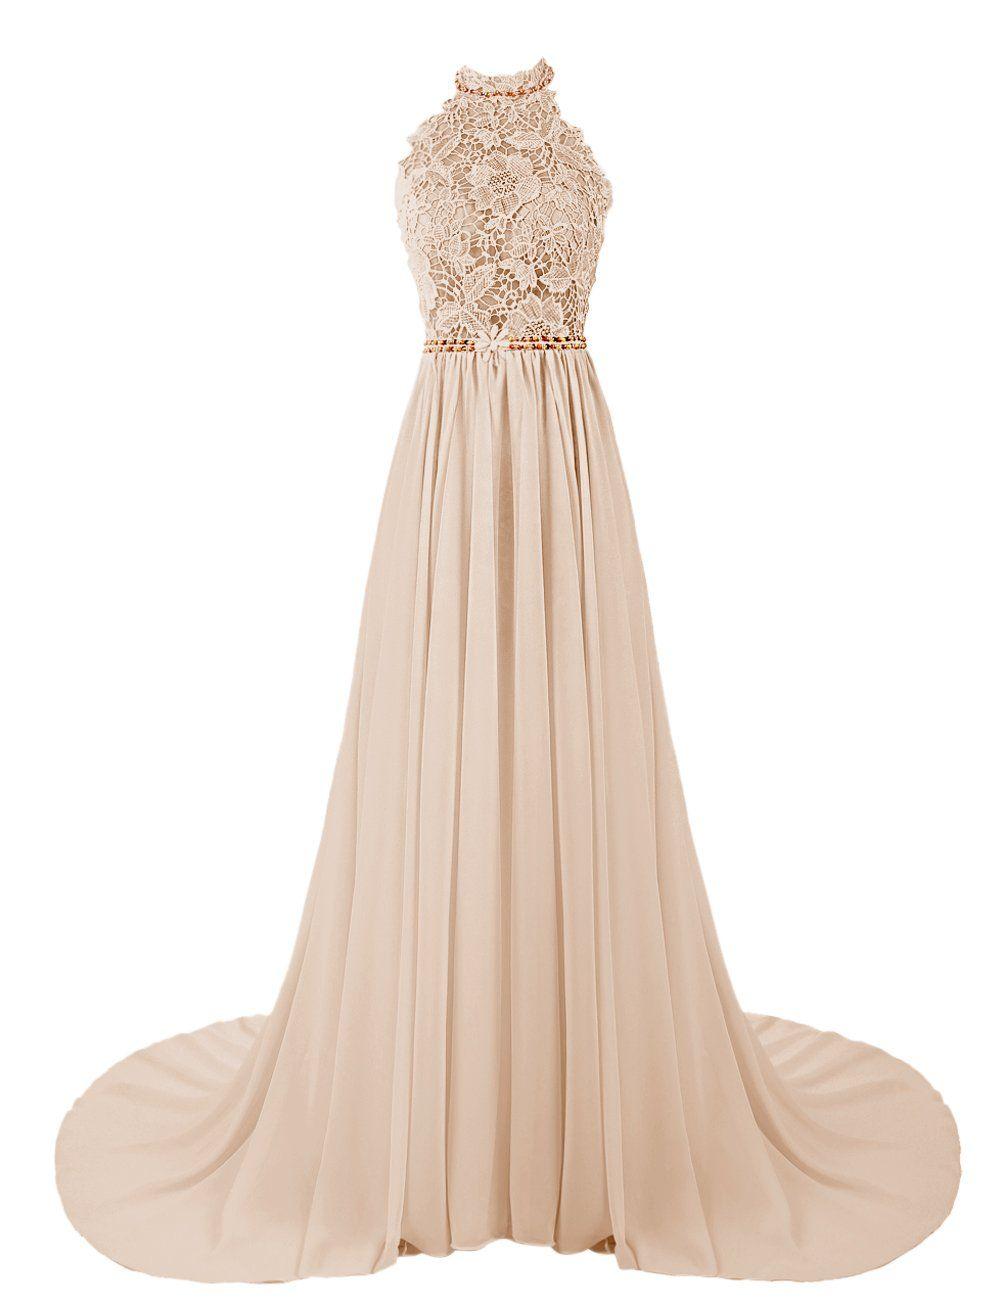 Dresstells womenus halter long prom dresses bridesmaid wedding